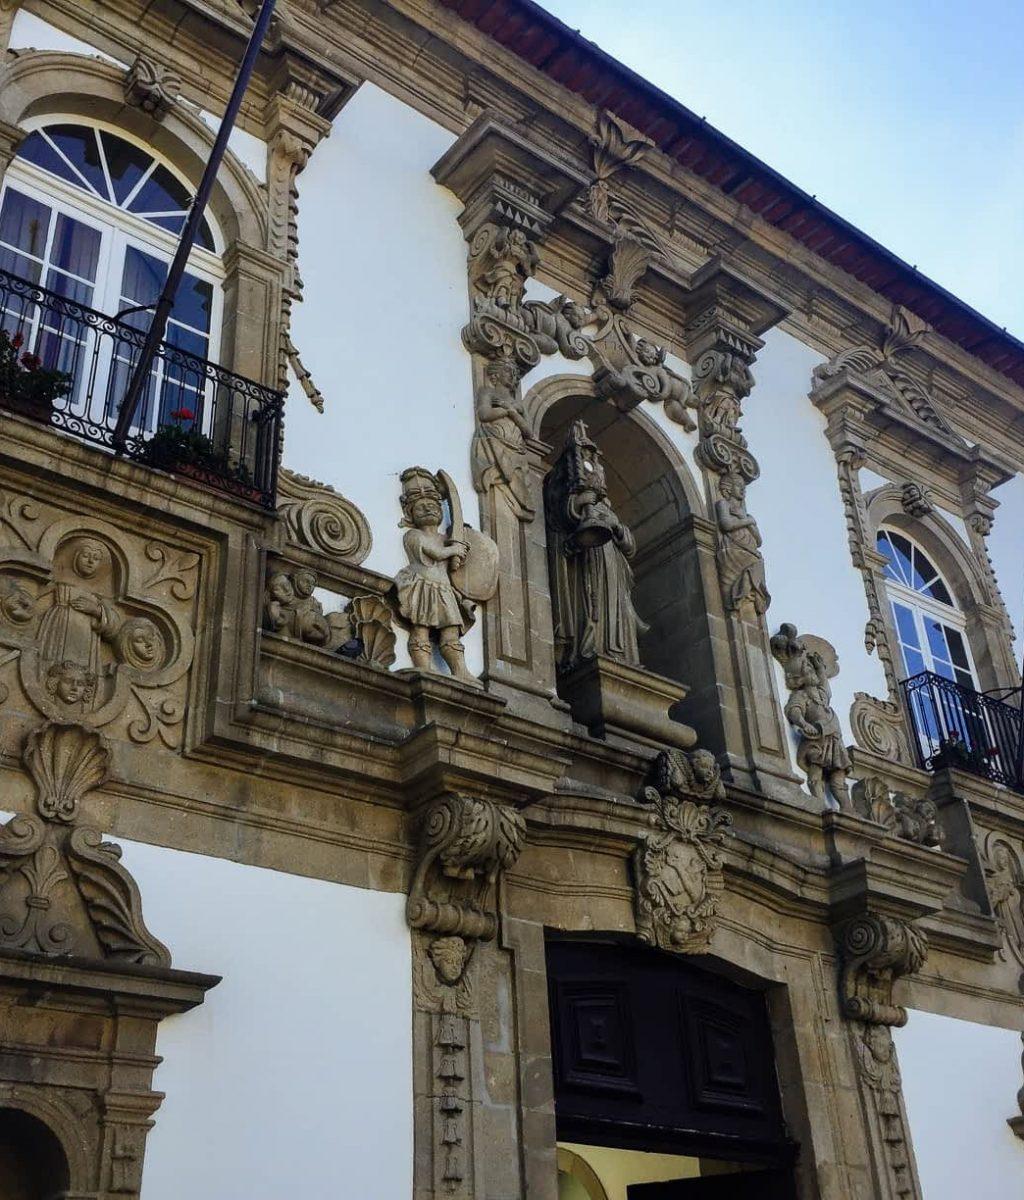 Day trip from Porto - Guimaraes